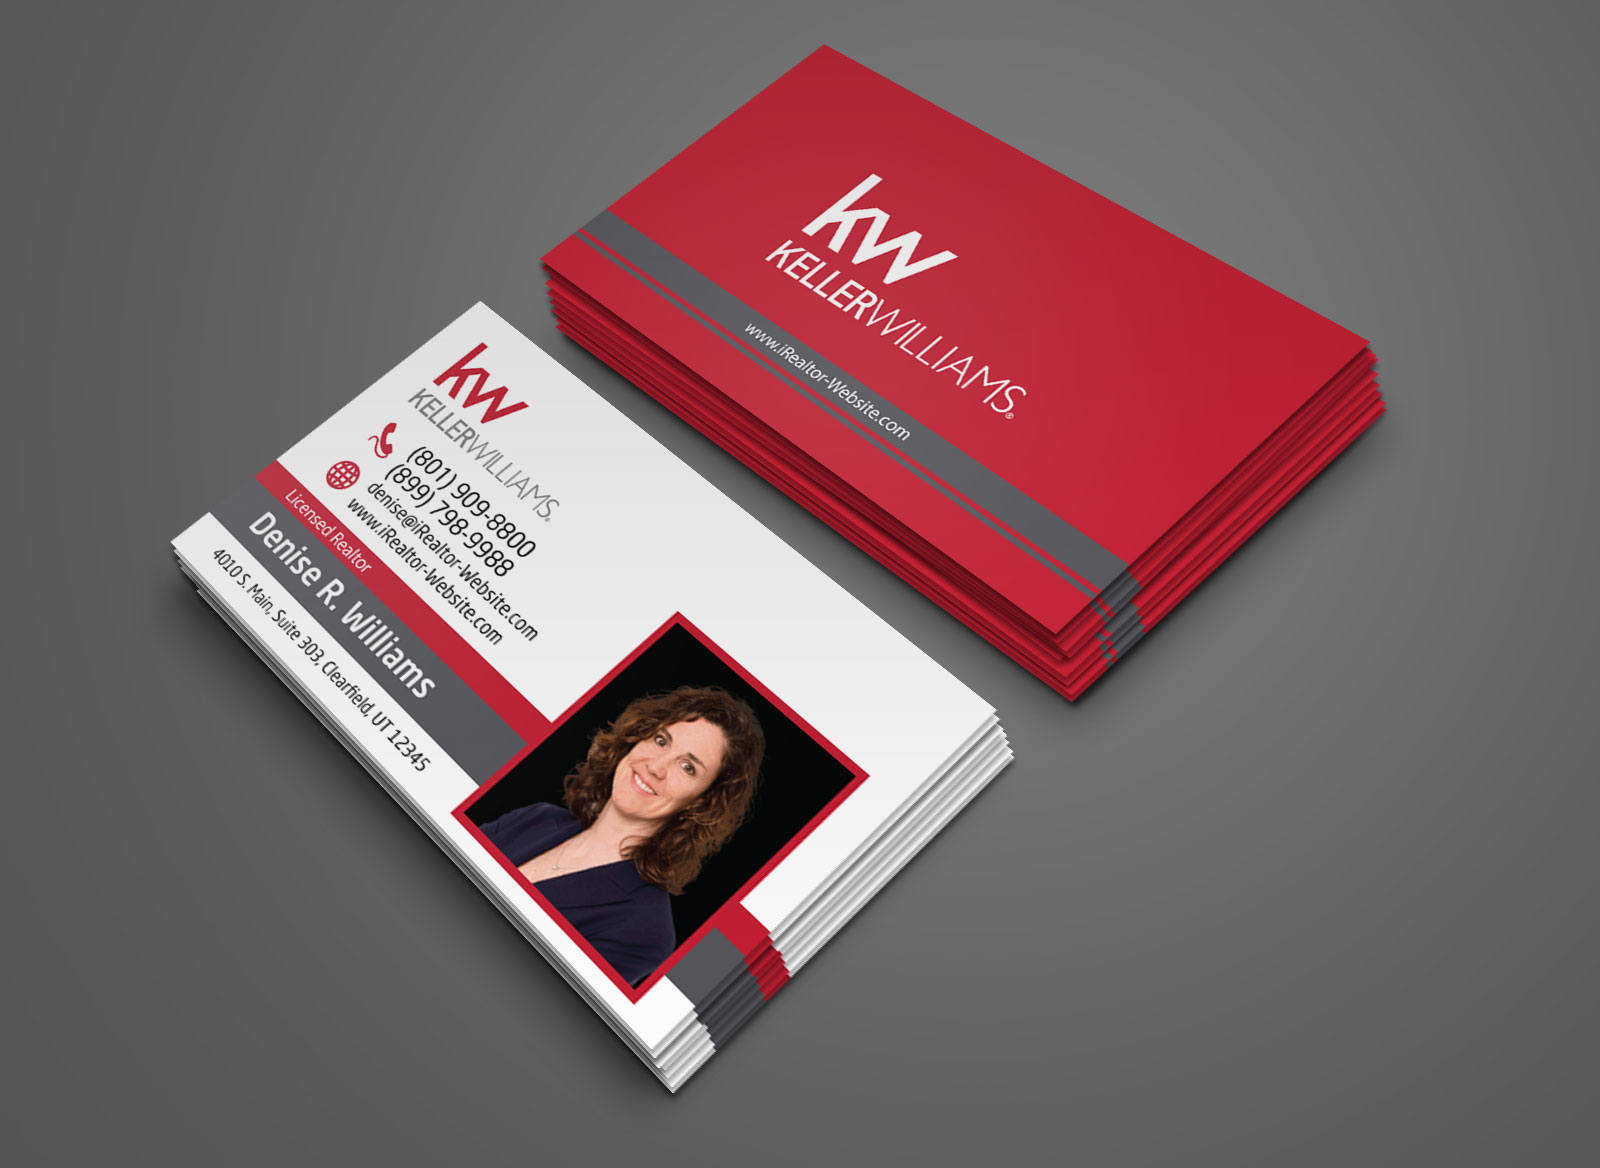 Keller Williams Business Card Century 21 Business Card